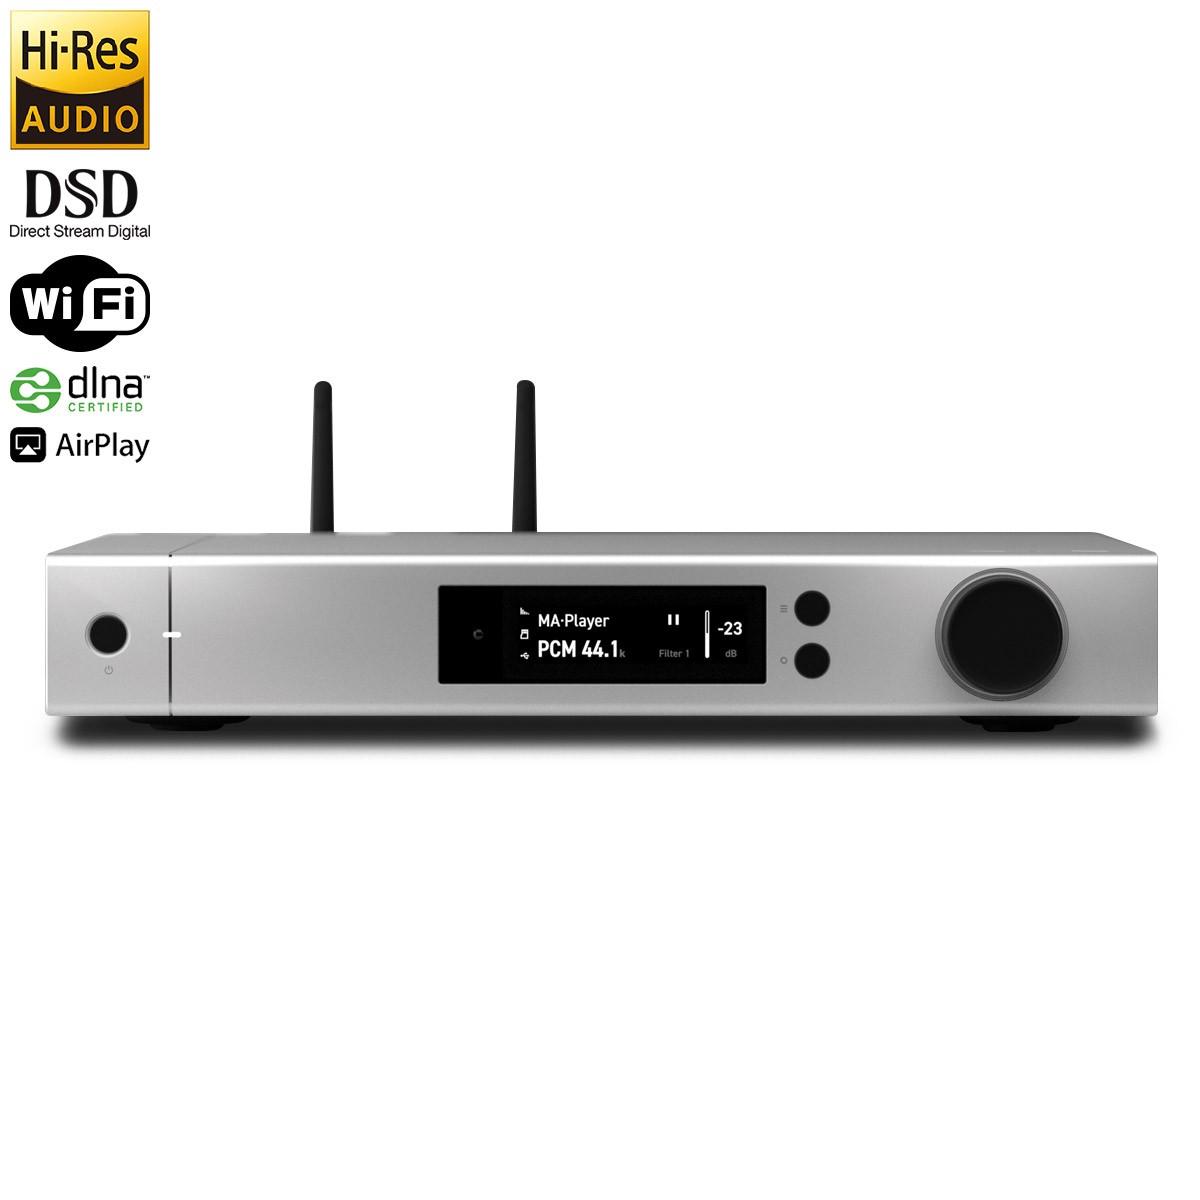 MATRIX ELEMENT P Streamer / ICEpower Amplifier / DAC ES9028PRO XMOS 32bit 768kHz DSD1024 2x230W 4 Ohm